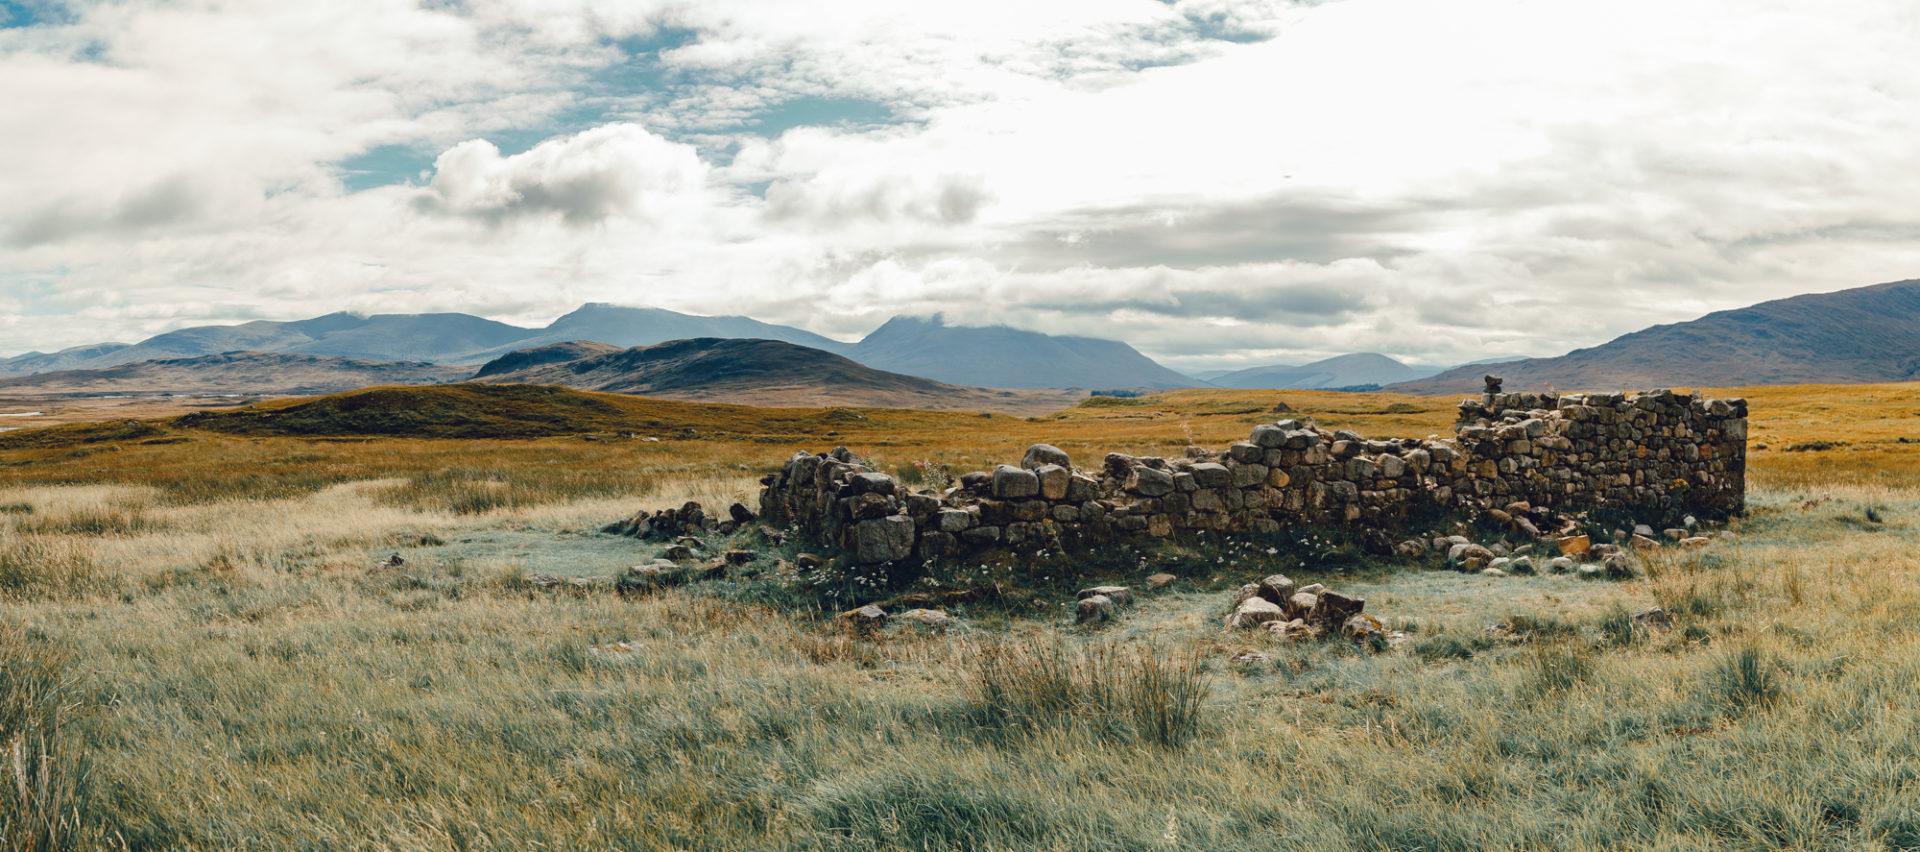 Ba Cottage am Rande des Rannoch Moors